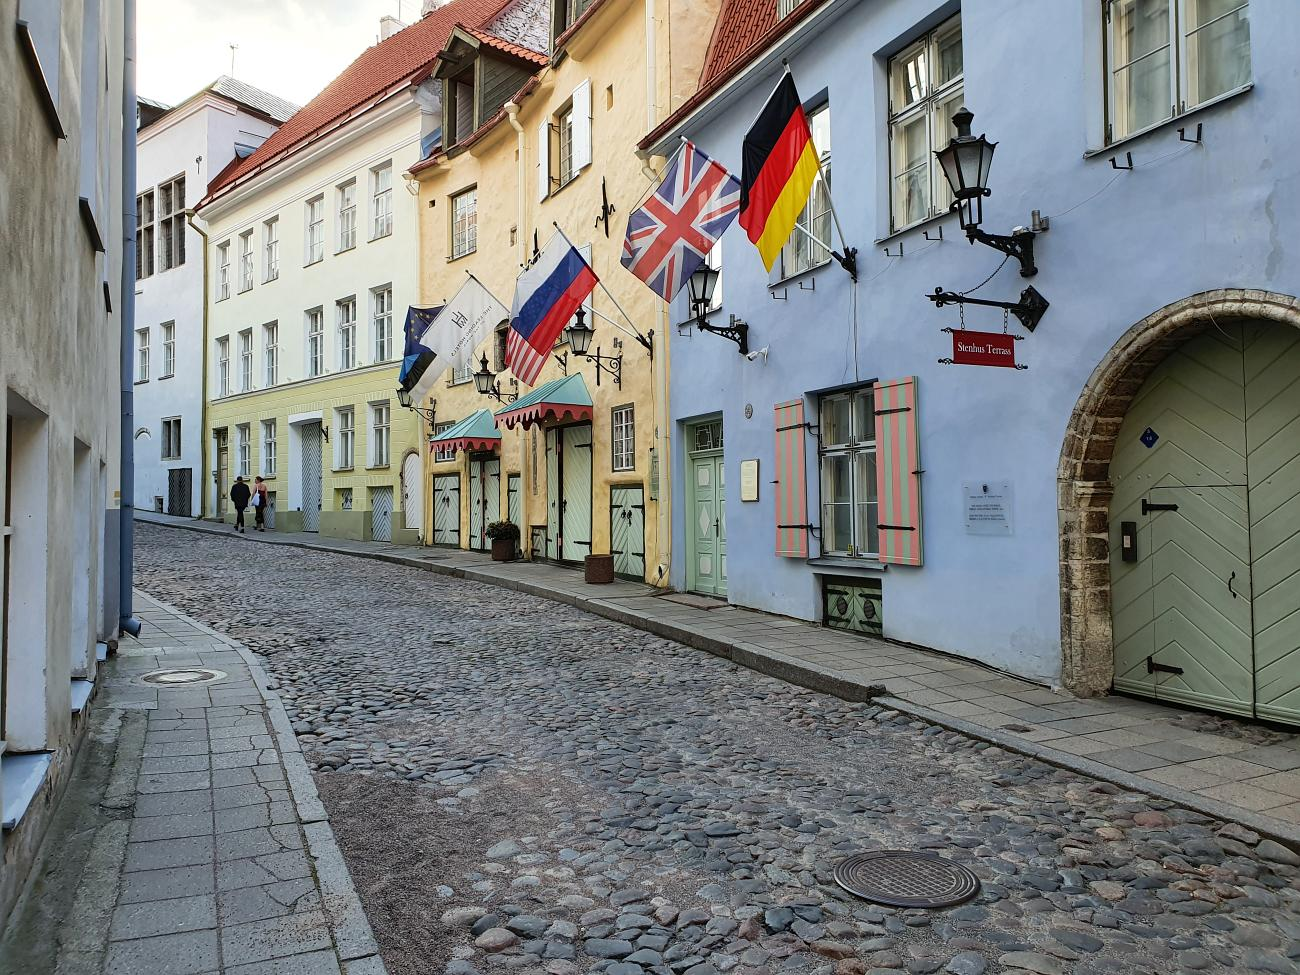 Luxurious Schlössle Hotel in Tallinn Old Town, on quiet side street